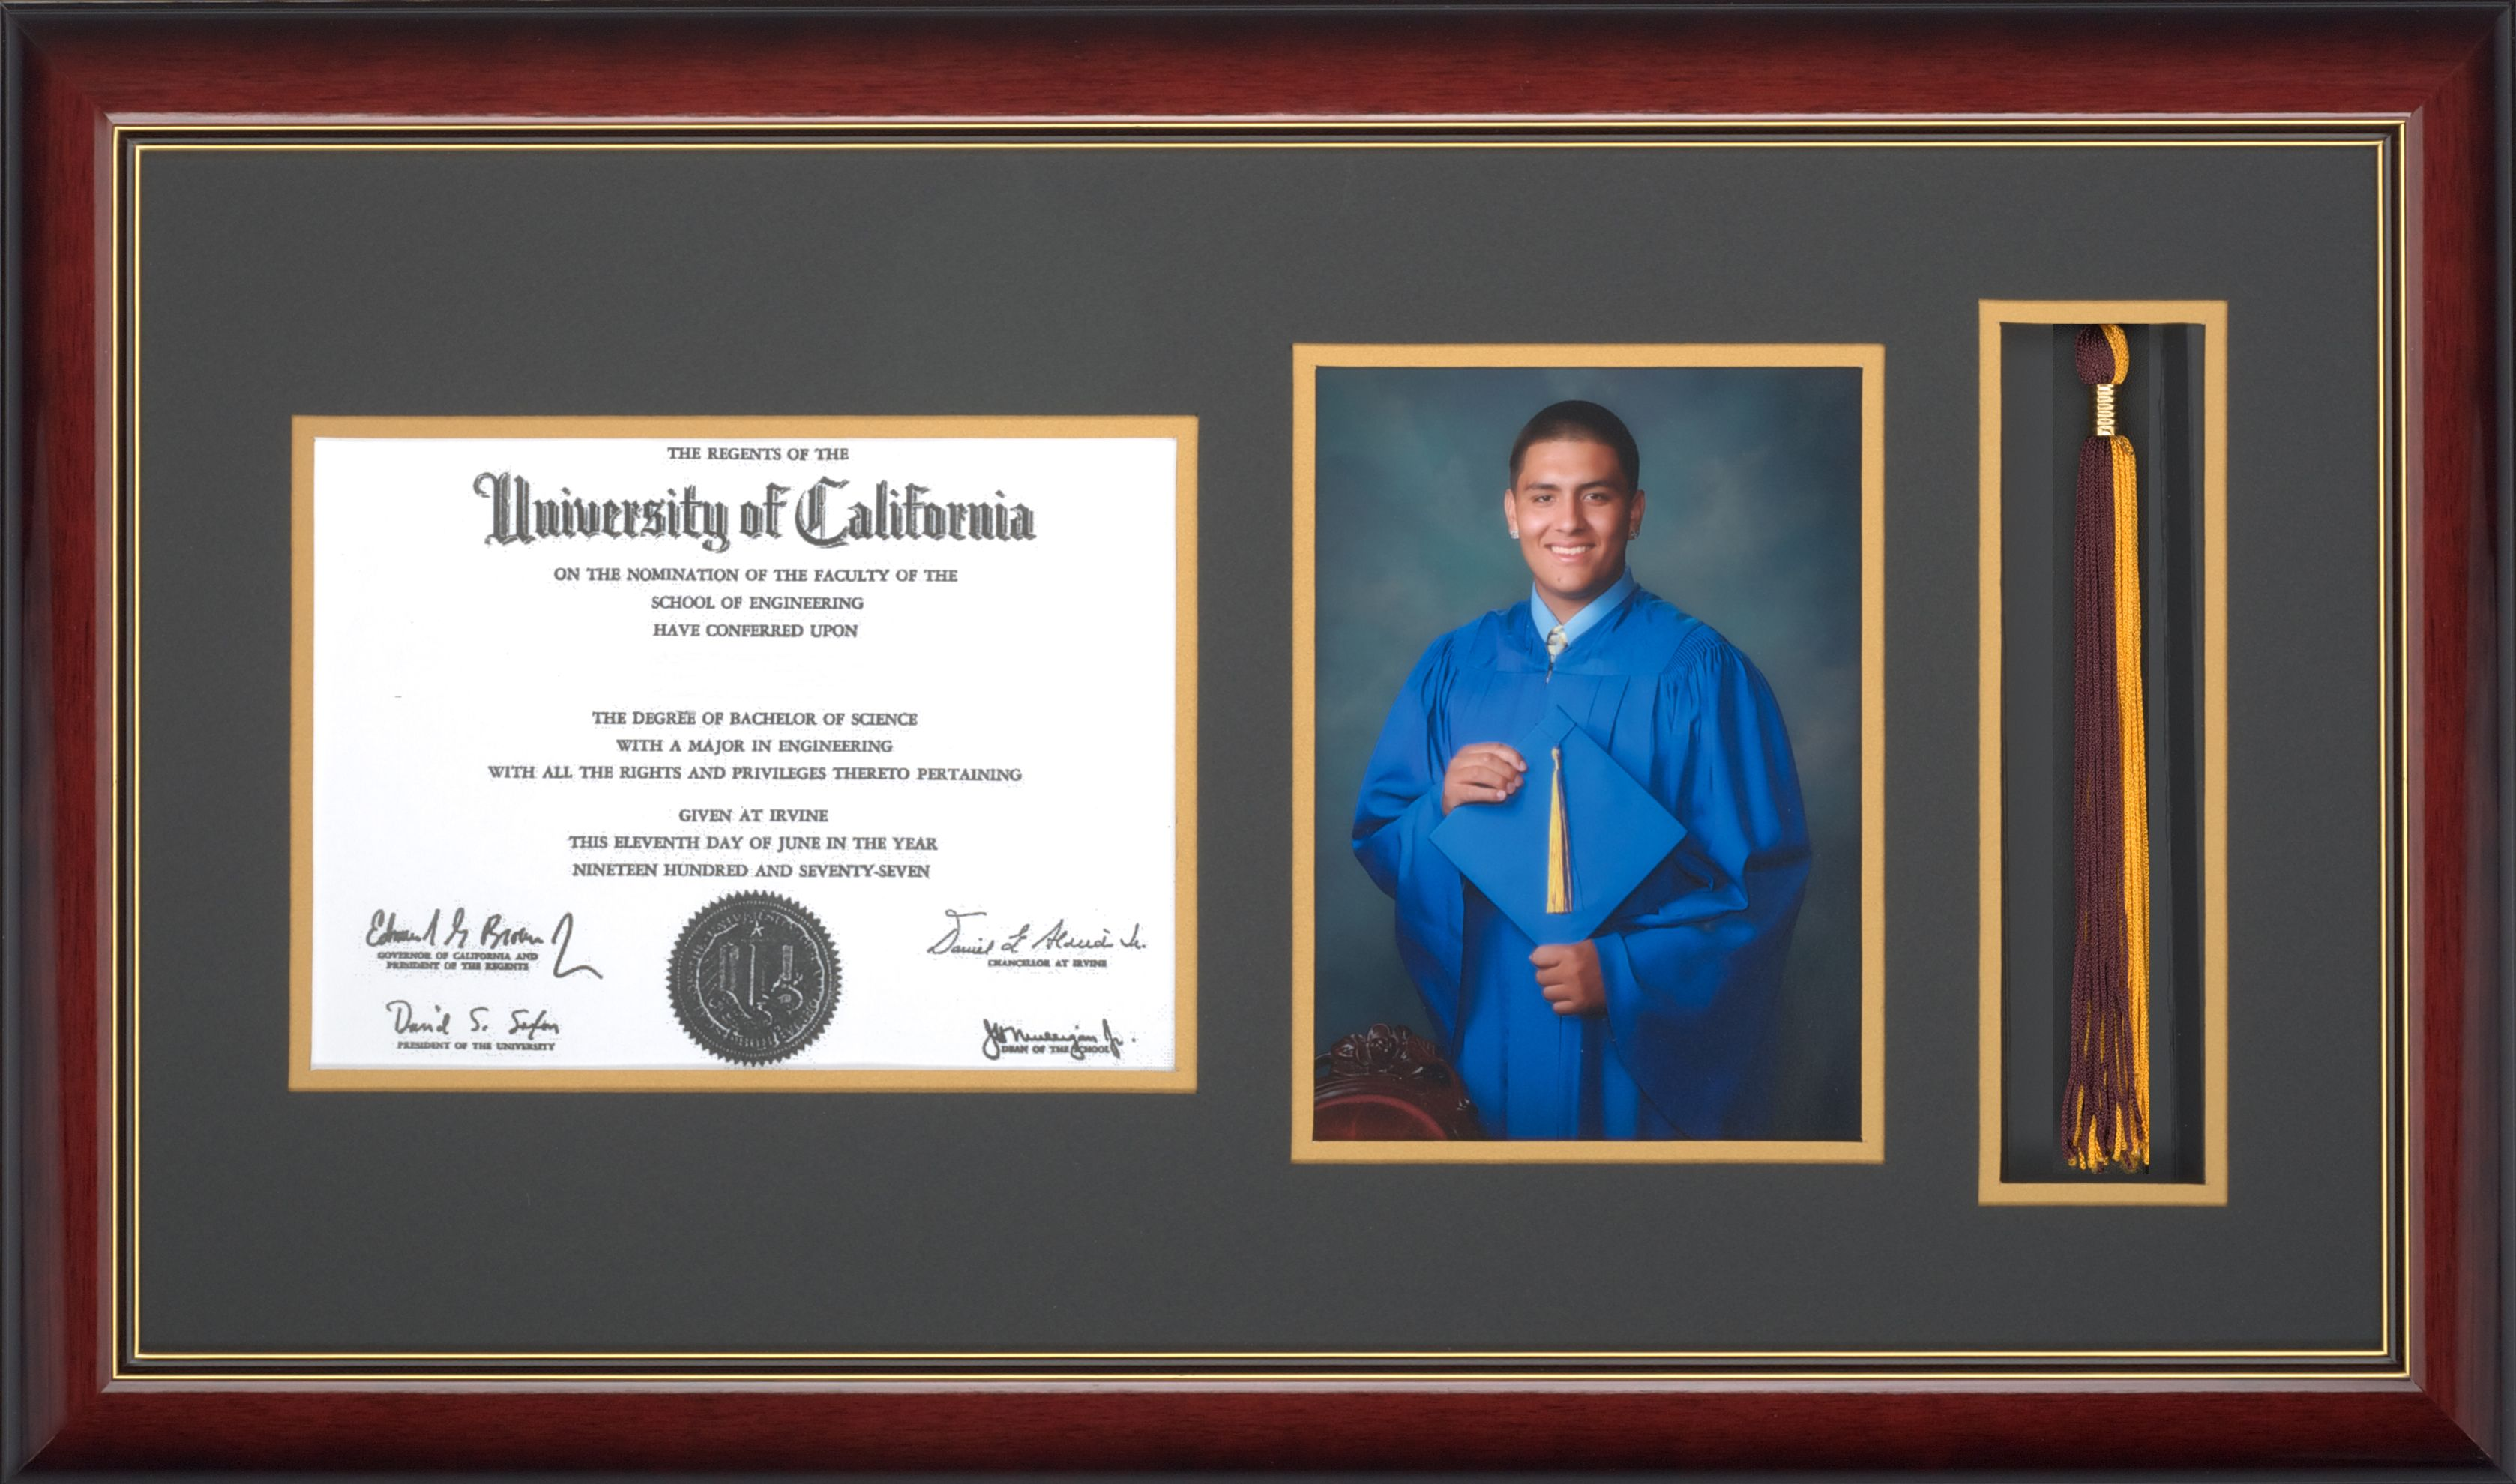 frames for graduation pictures | Grad Framer - Diploma Picture ...